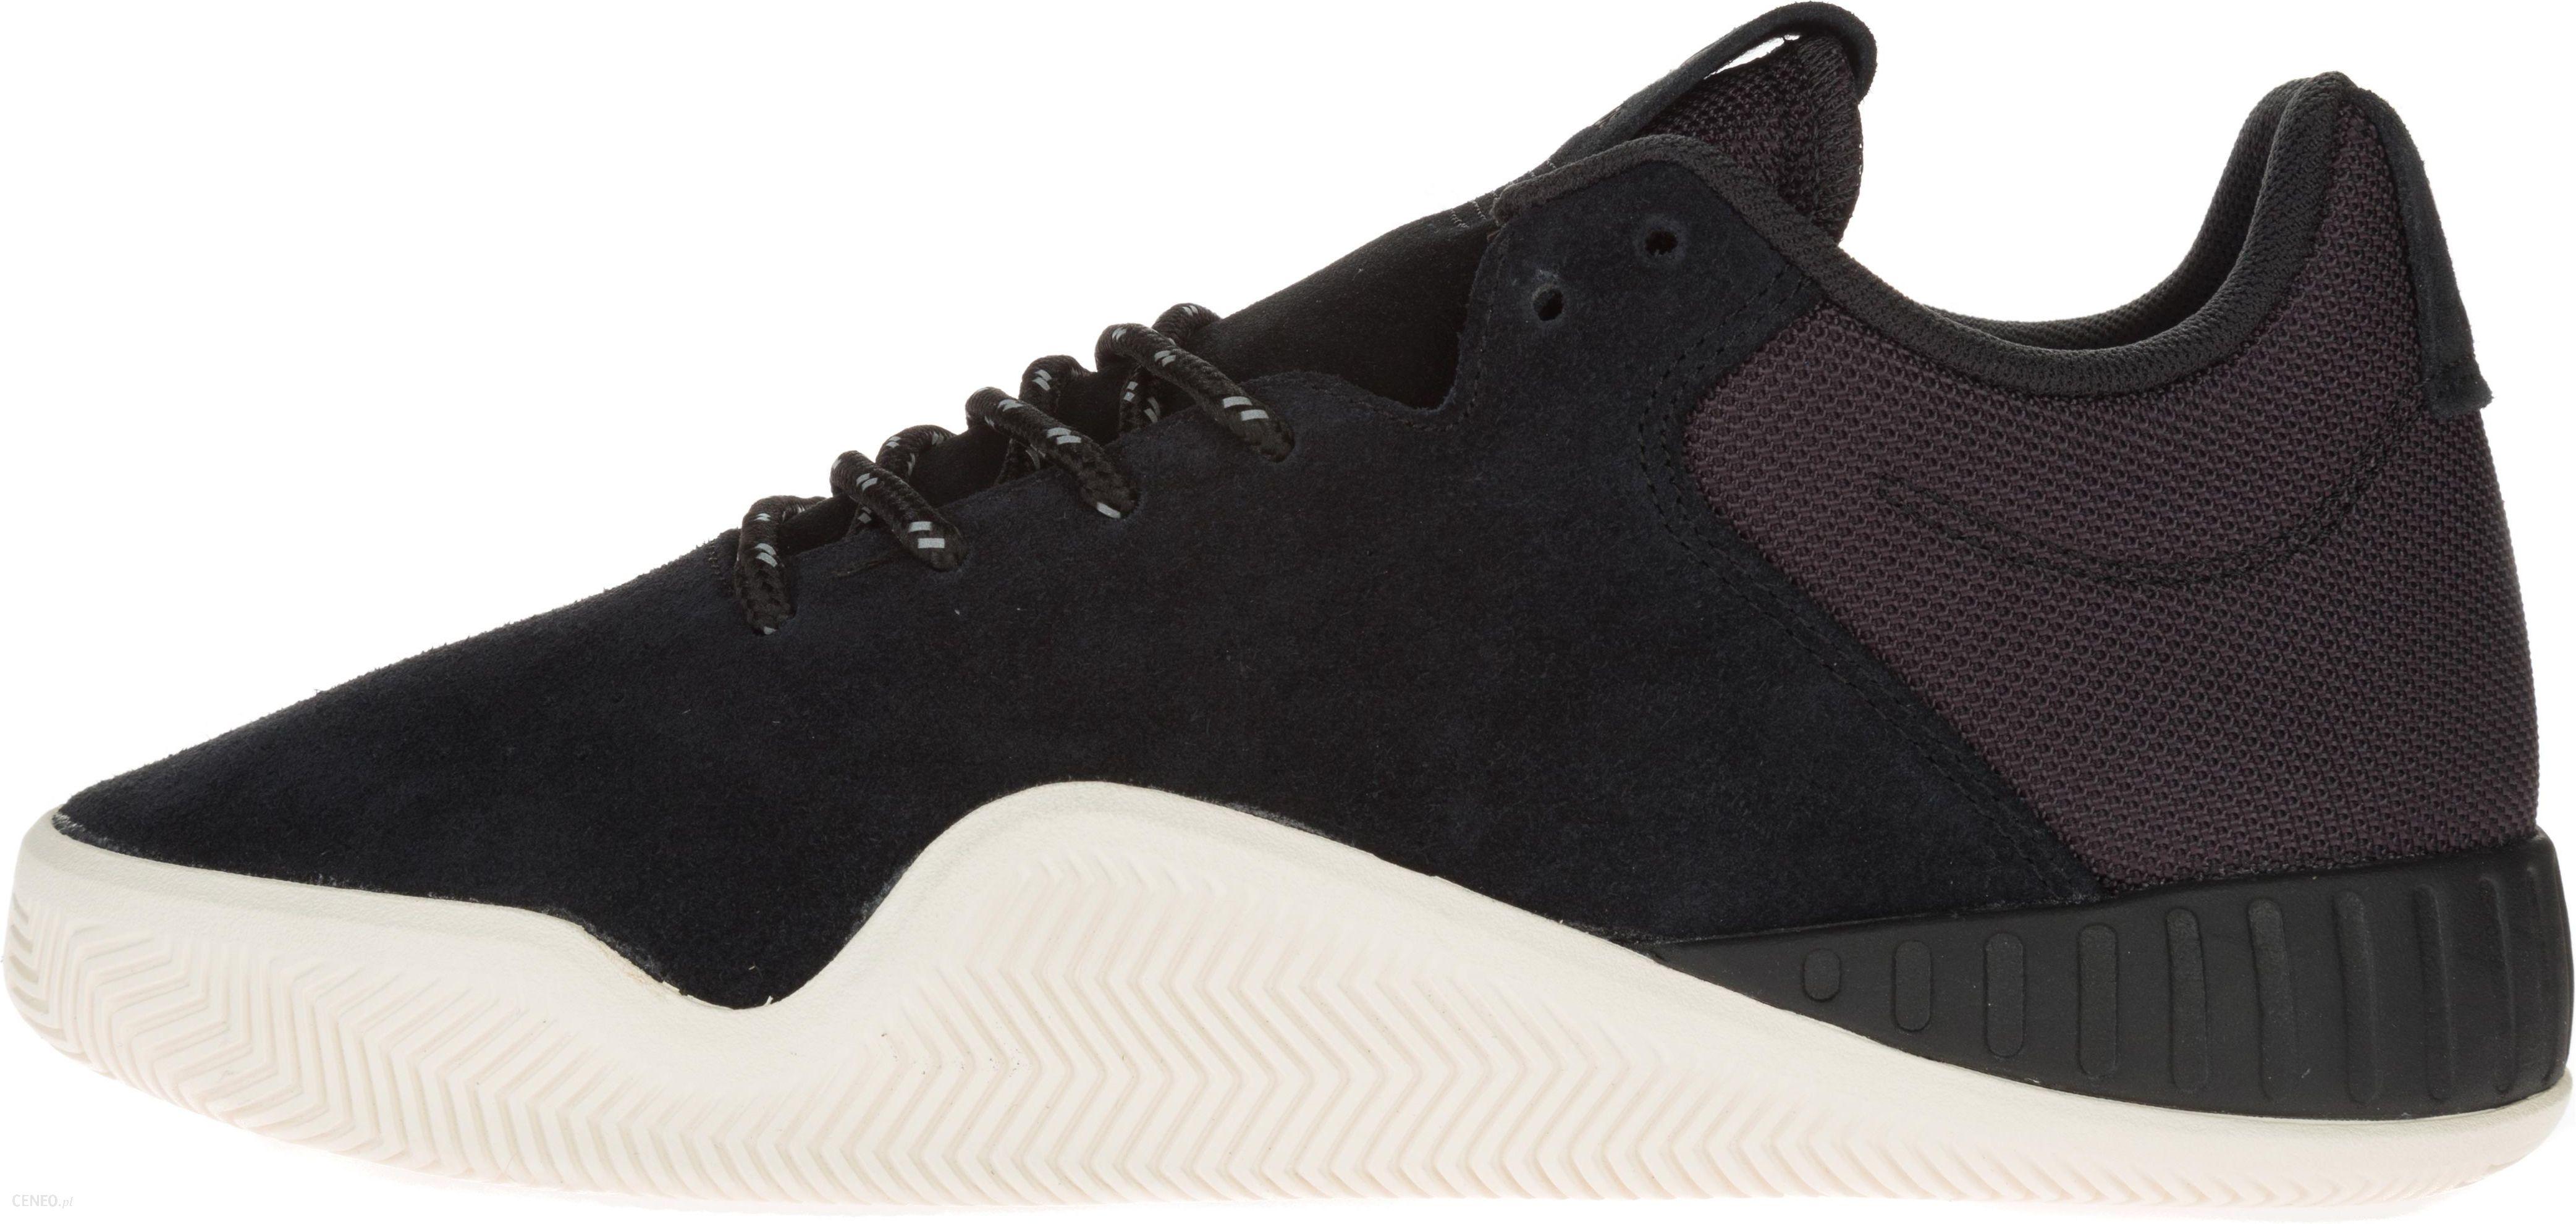 adidas Originals Tubular Instinct Low Sneakers Czarny 40 23